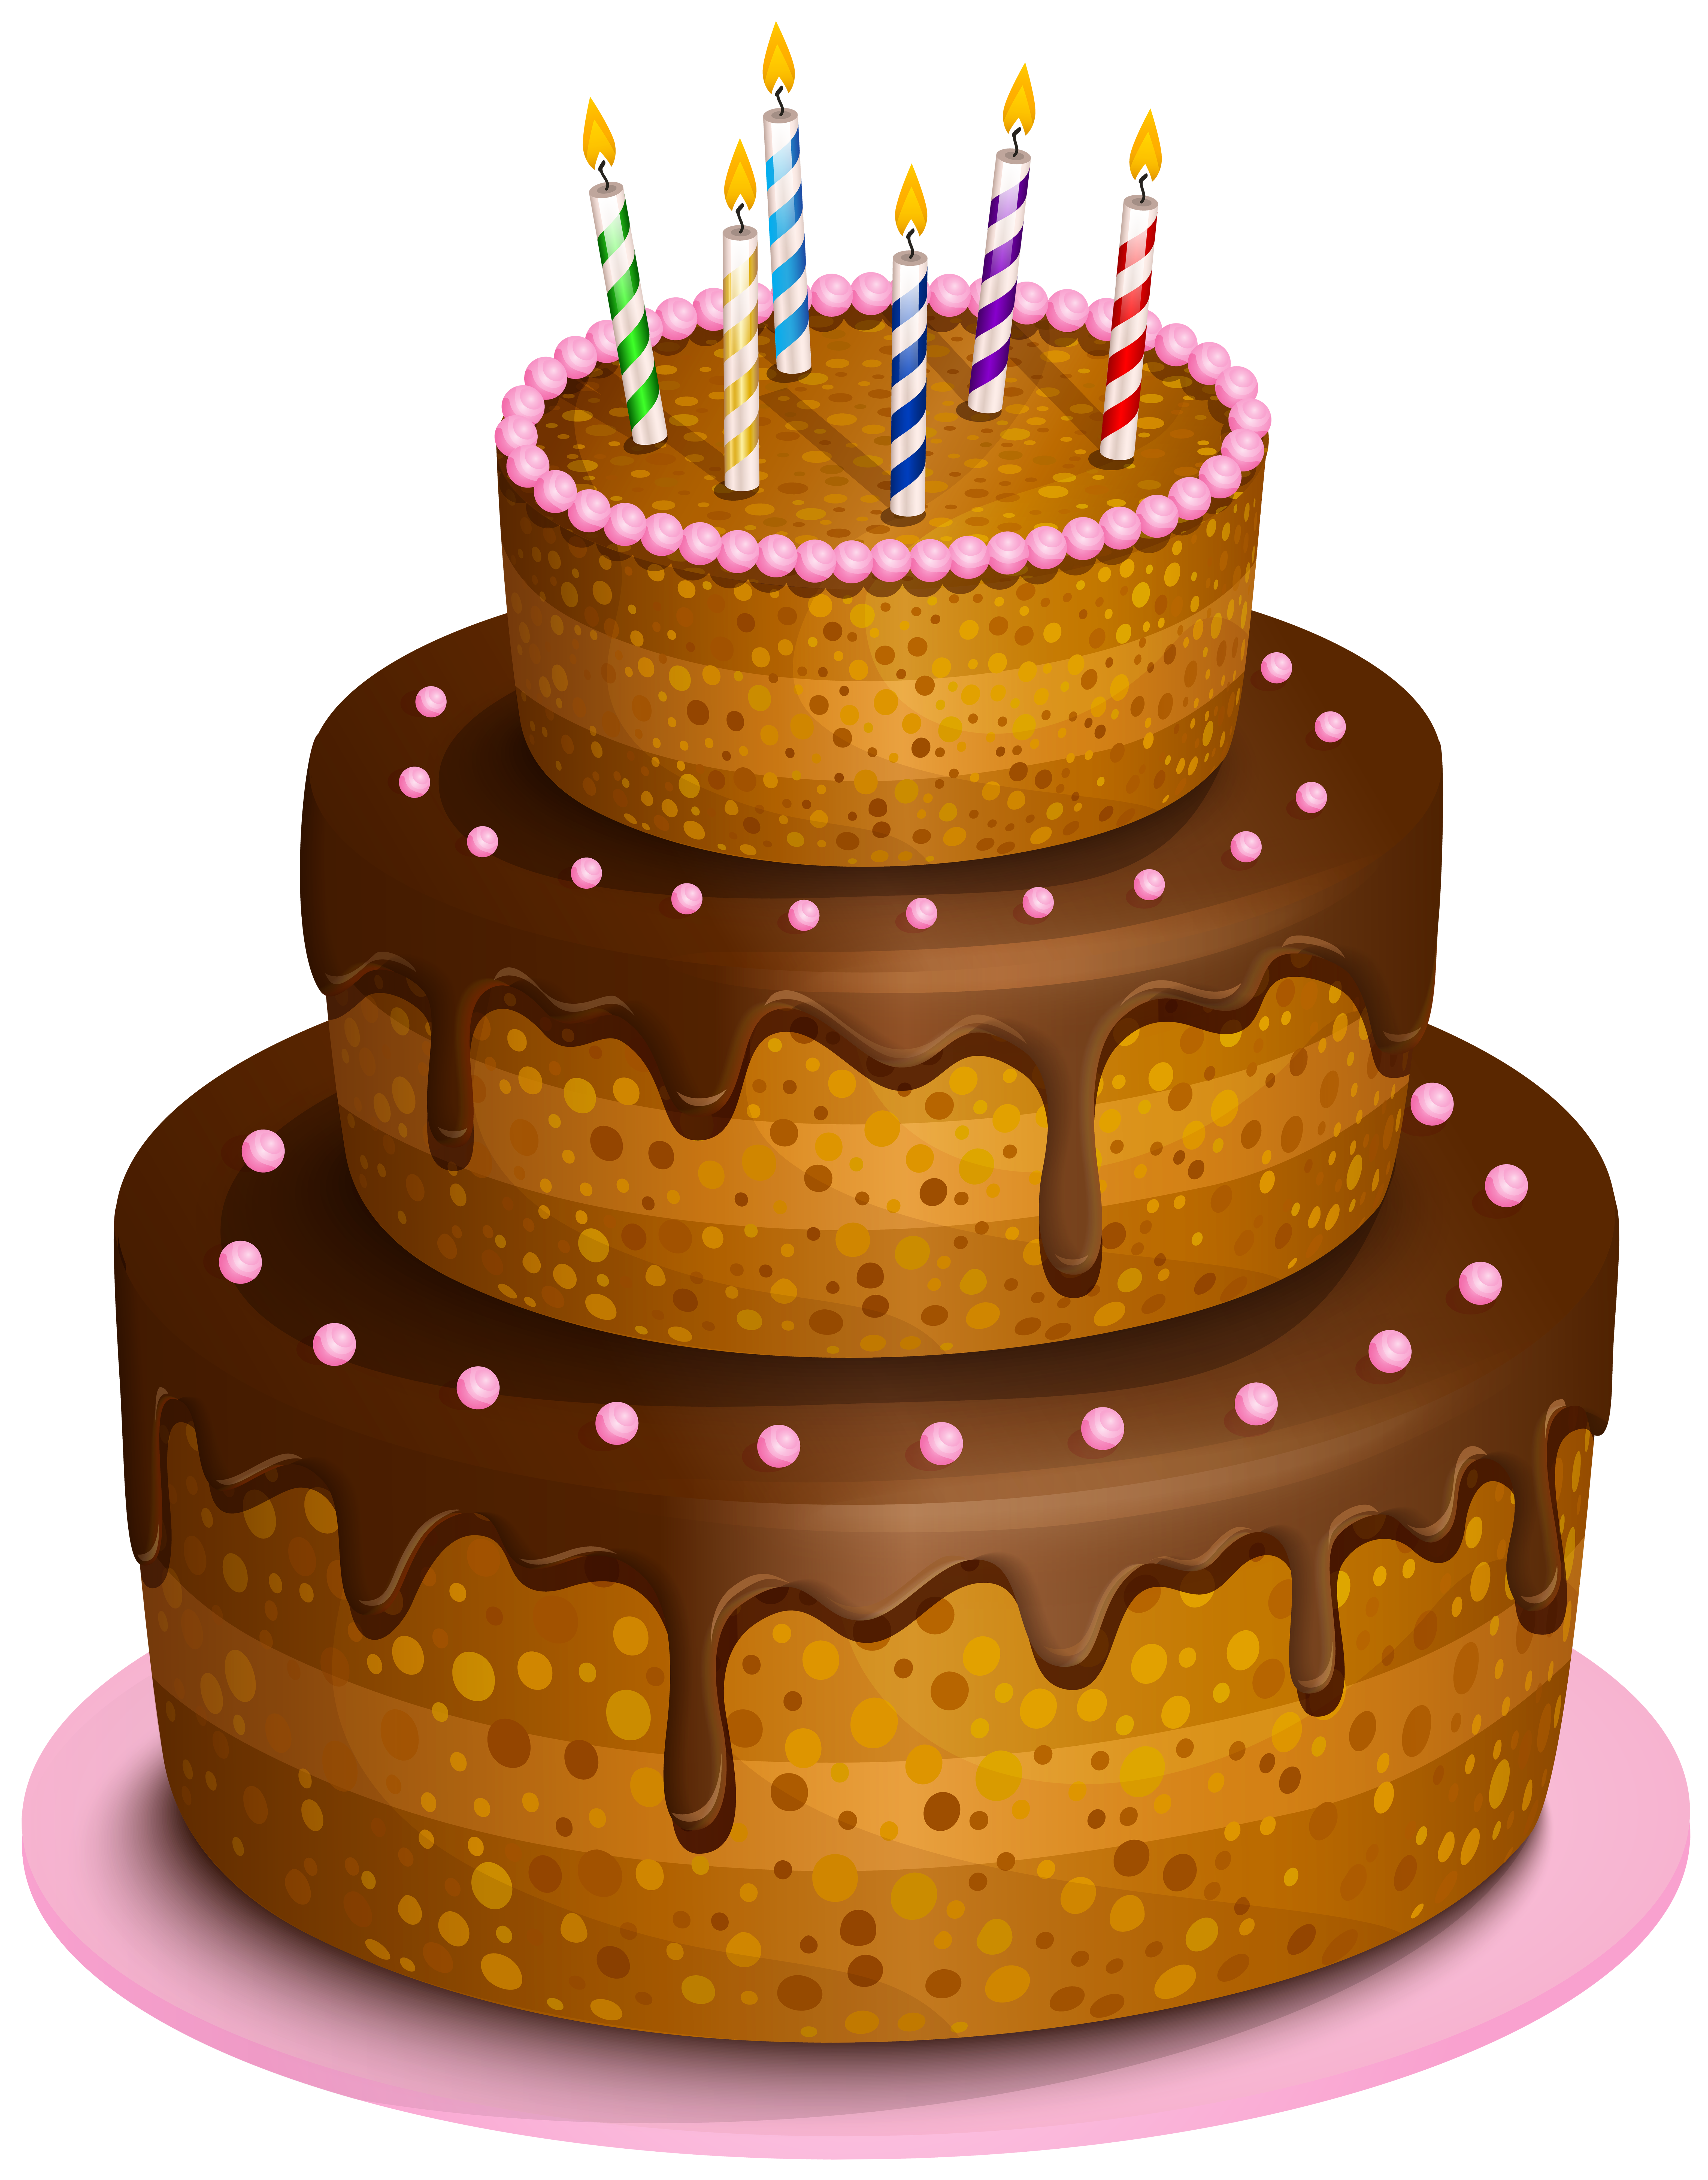 Birthday Cake Transparent PNG Clip Art Image.